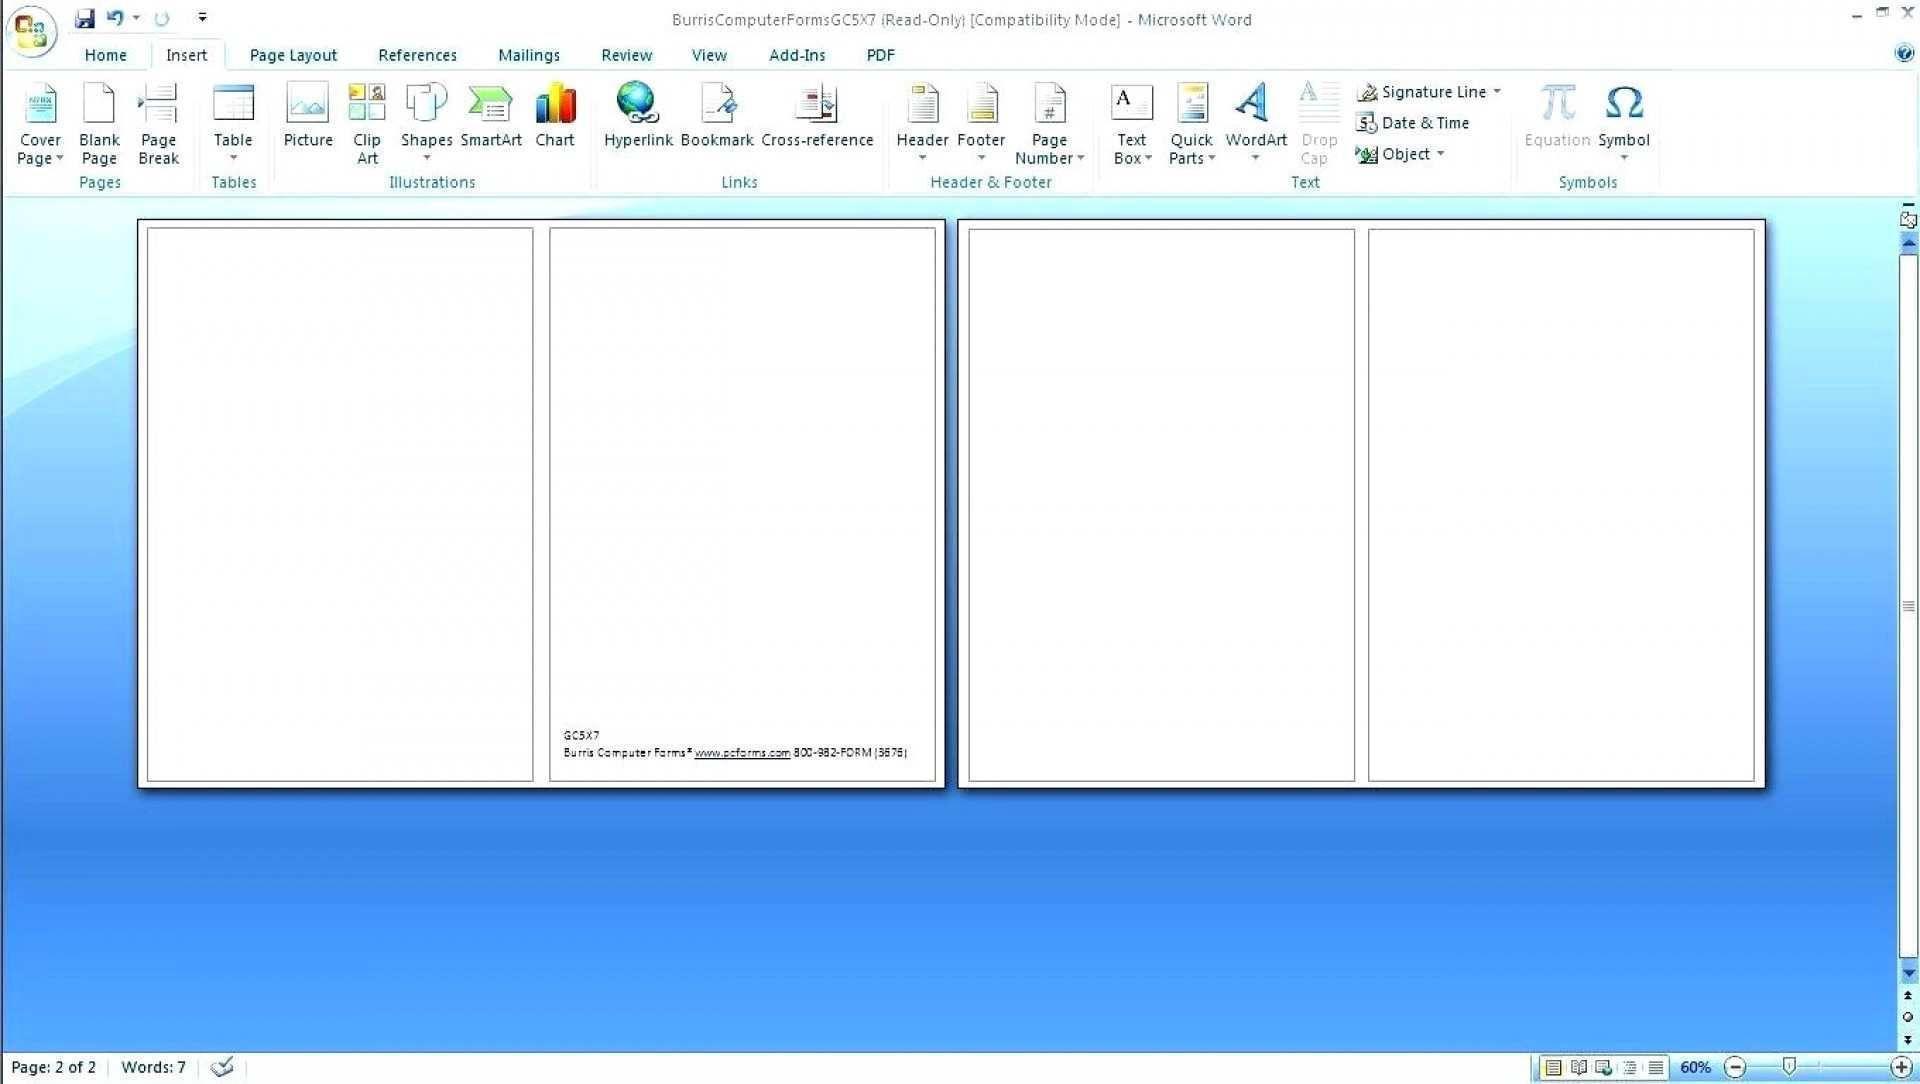 002 Astounding Microsoft Word Card Template Idea  Birthday Download Busines FreeFull